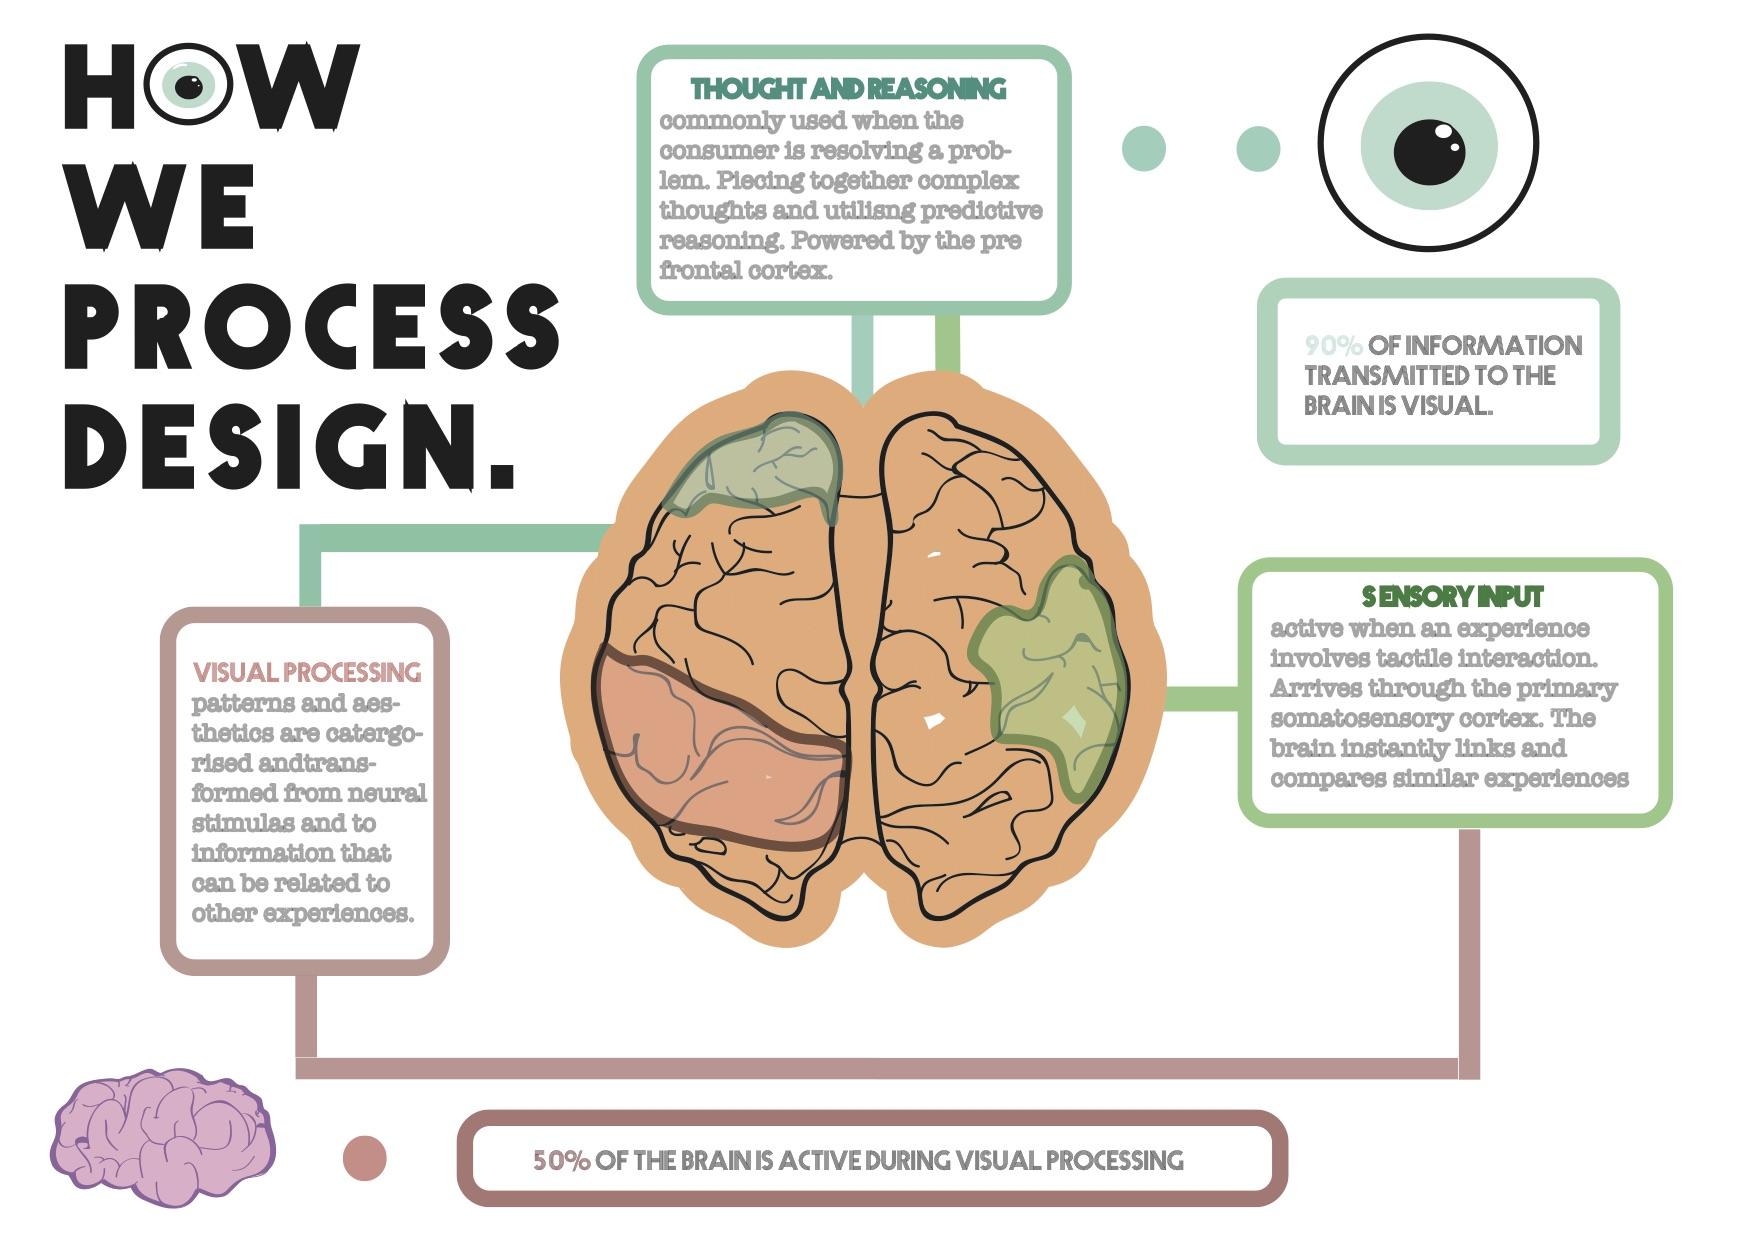 How we process design